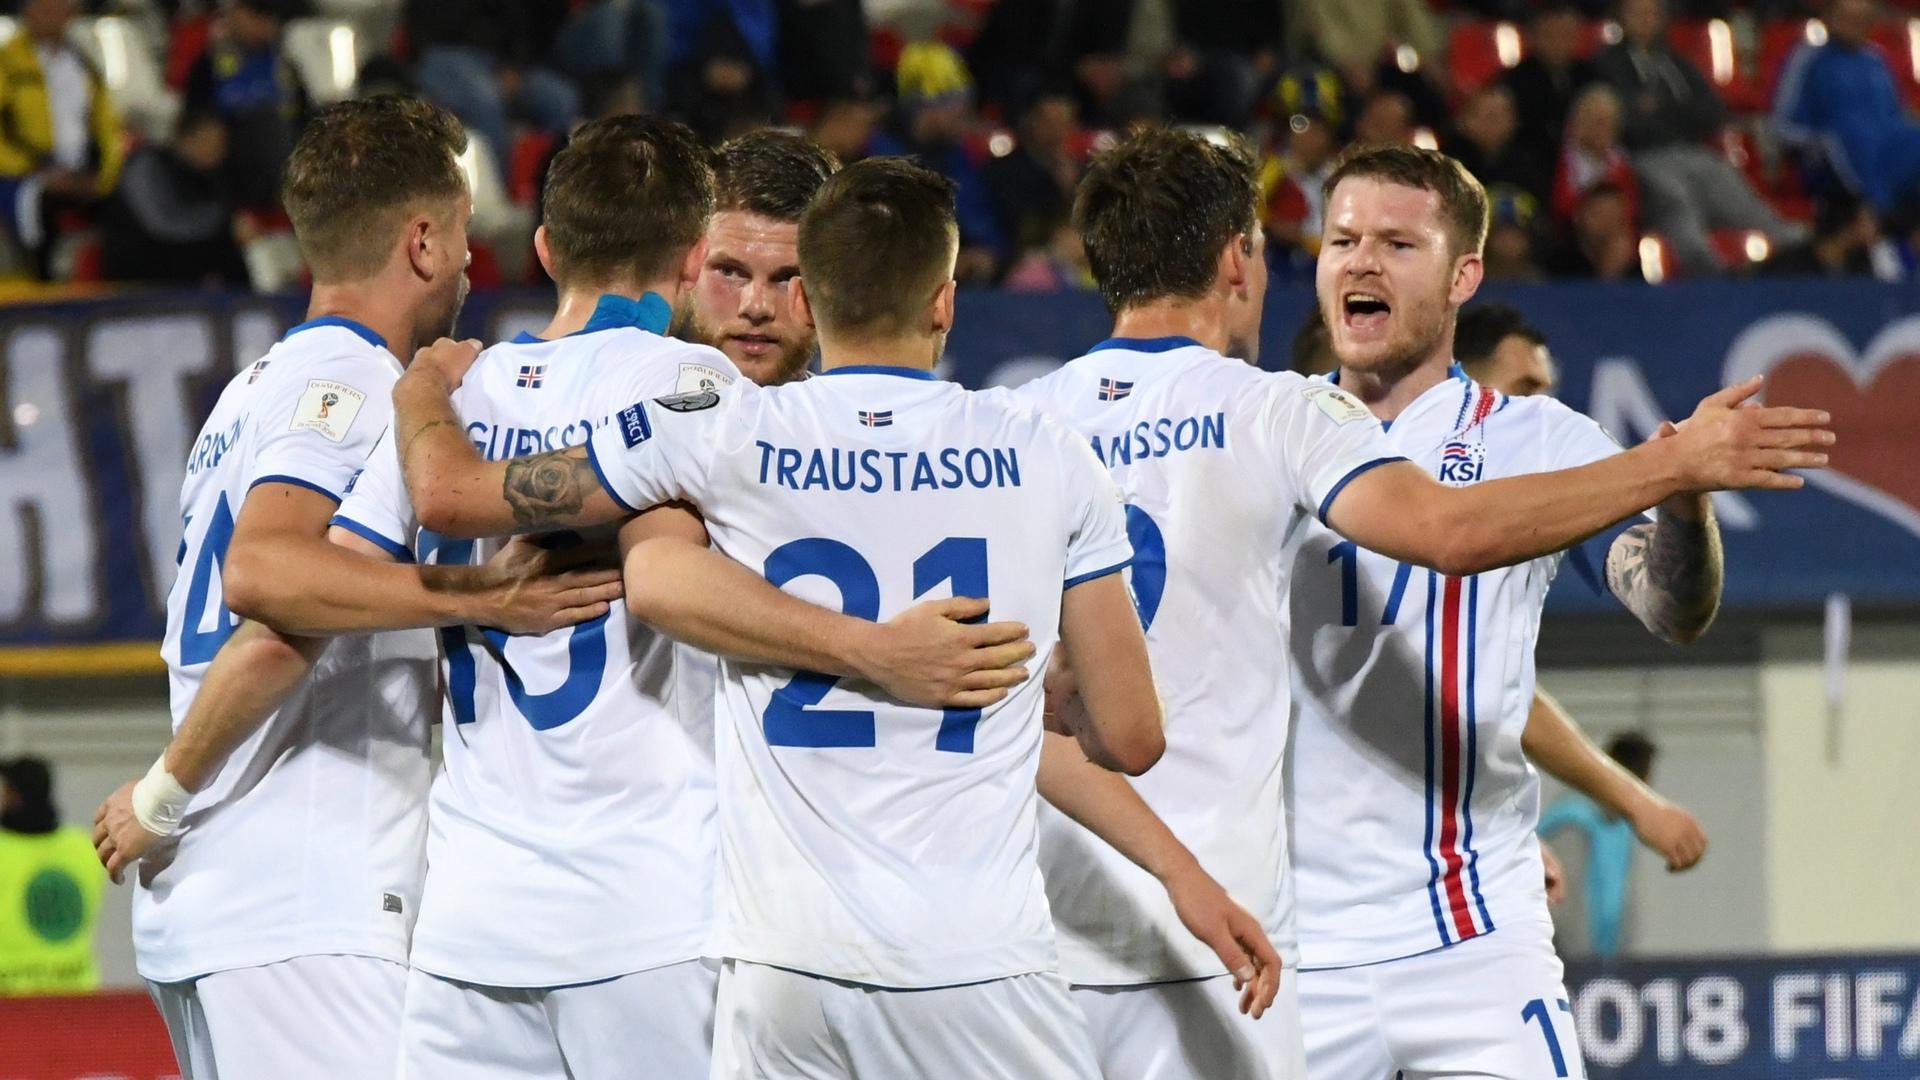 Kosova Iceland Goal Celebration 03242017